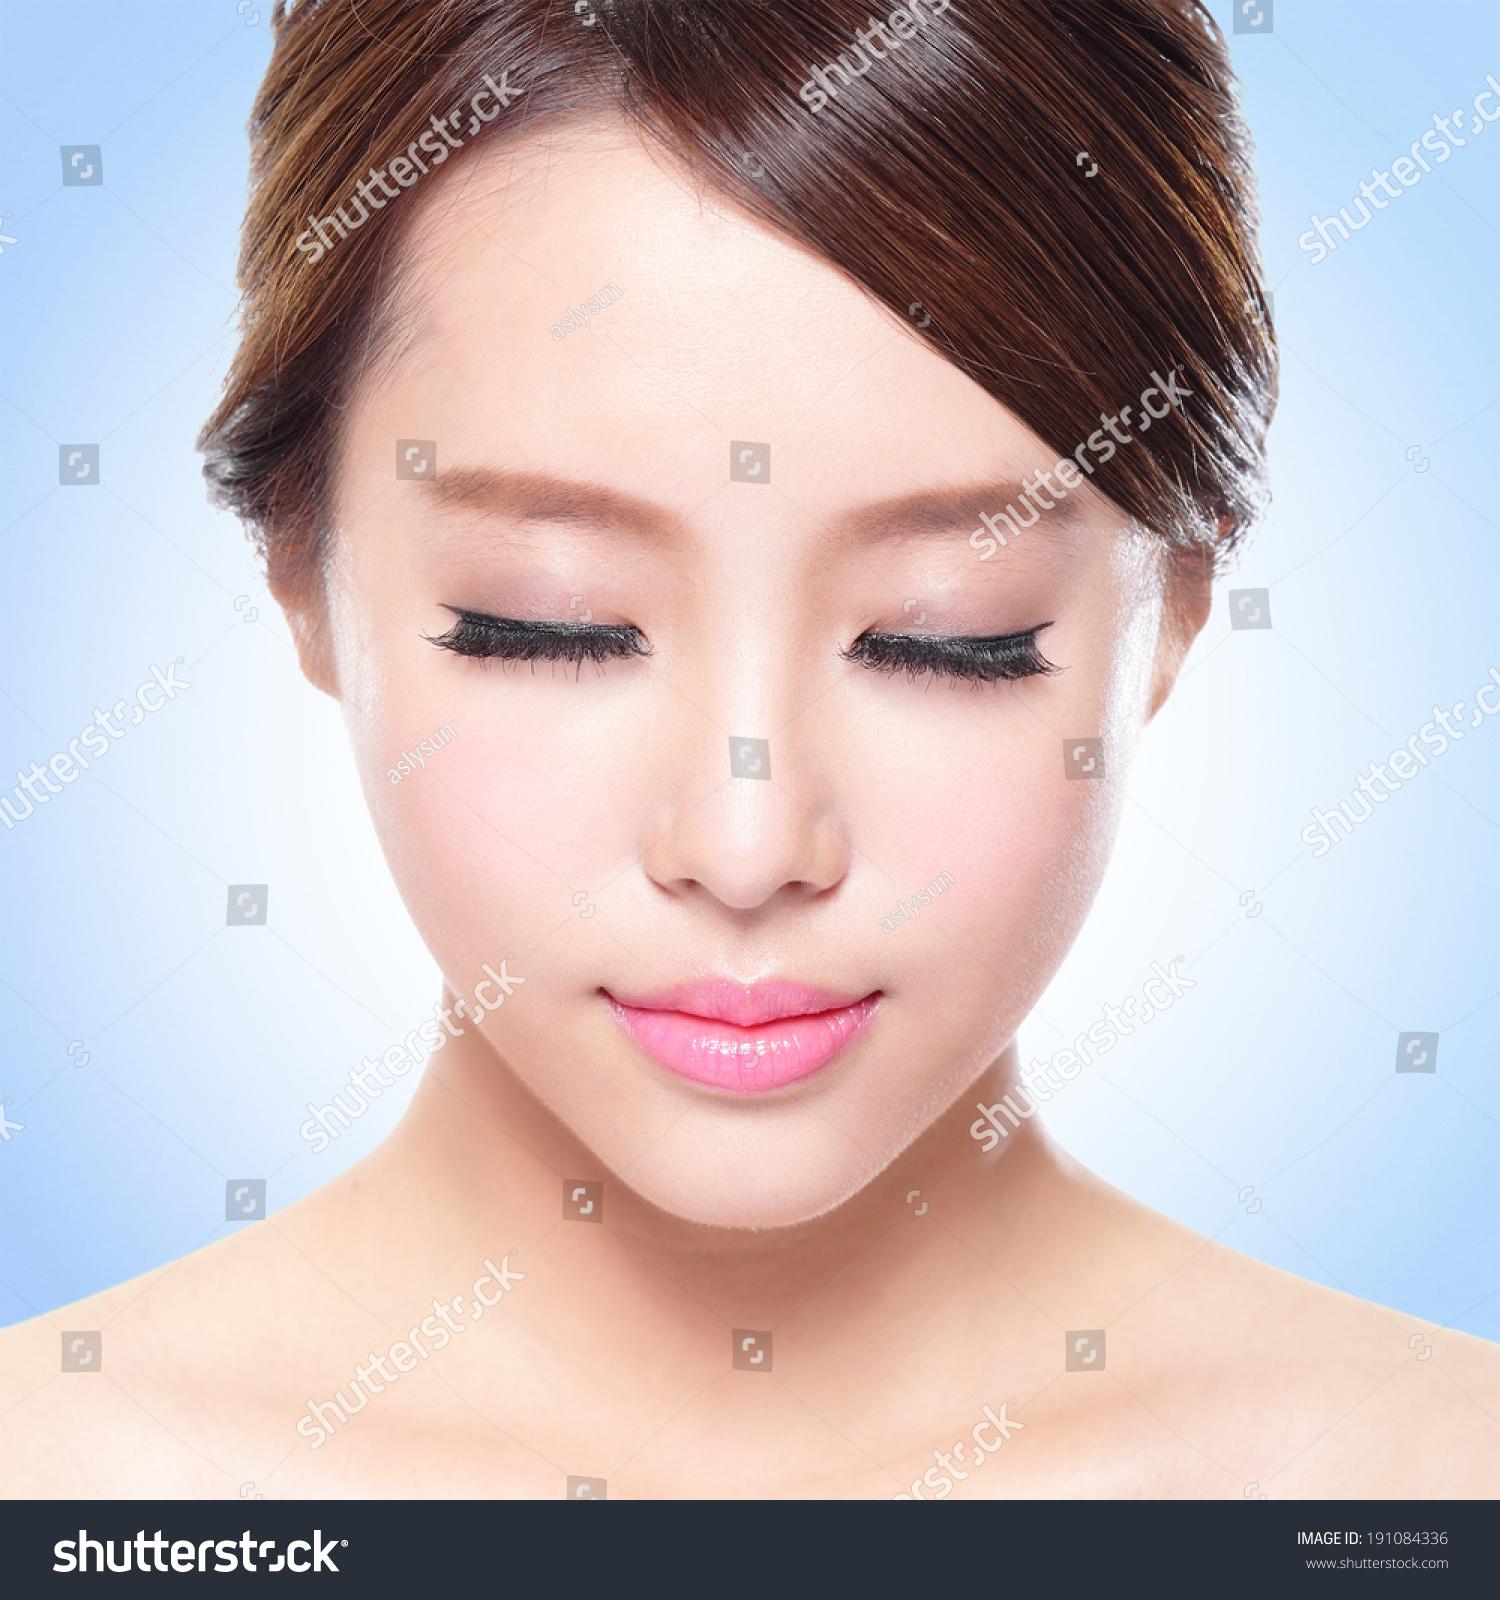 Close Attractive Skin Care Woman Face Stock Photo